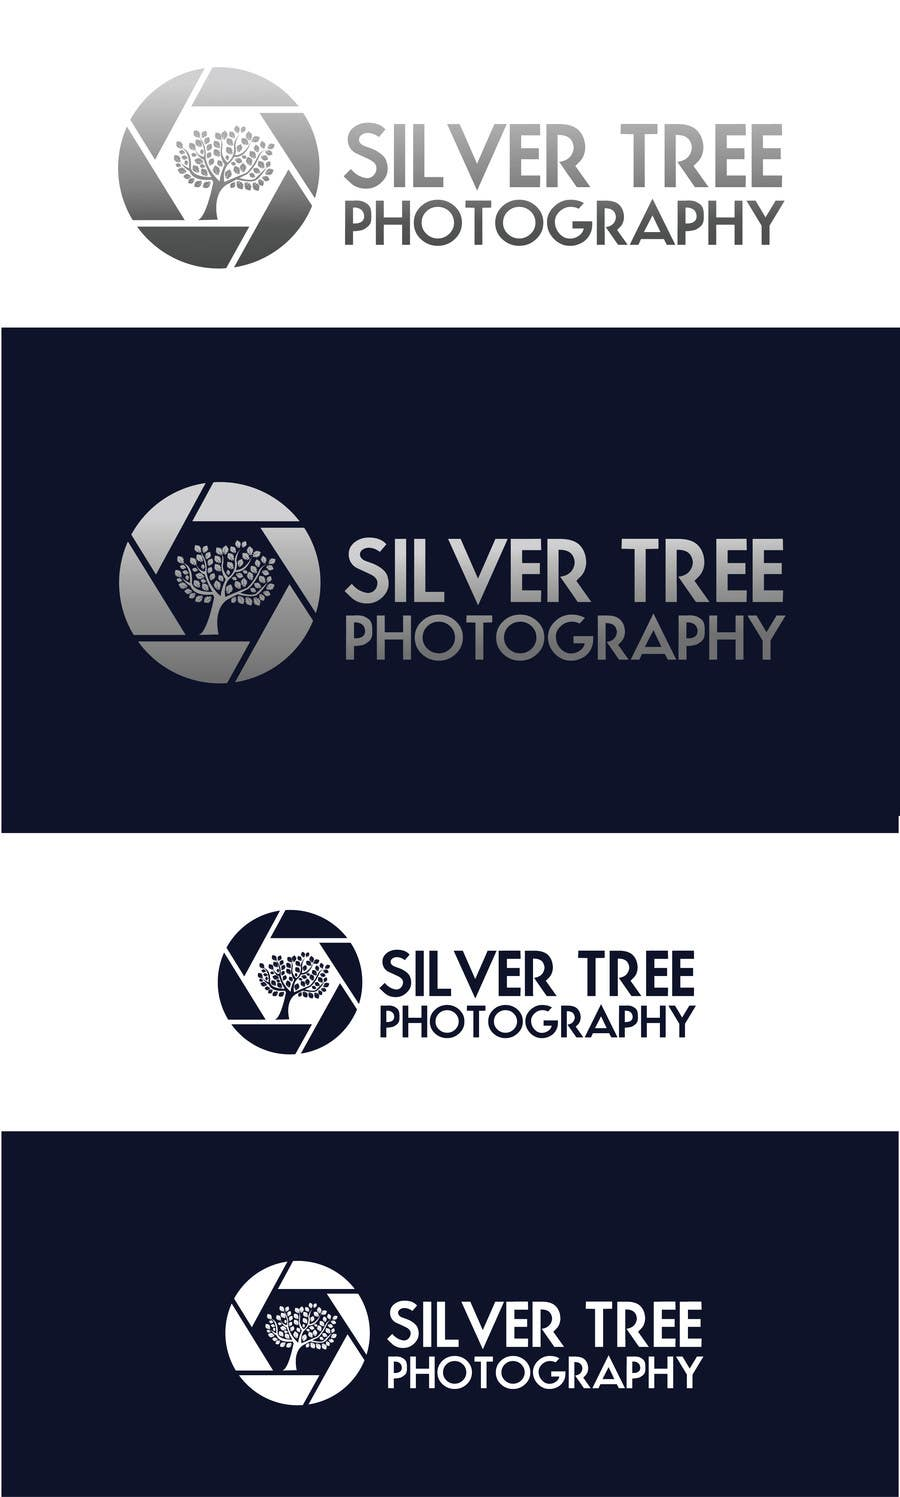 Bài tham dự cuộc thi #                                        3                                      cho                                         Design A Logo for New Photographer - Silver Tree Photography